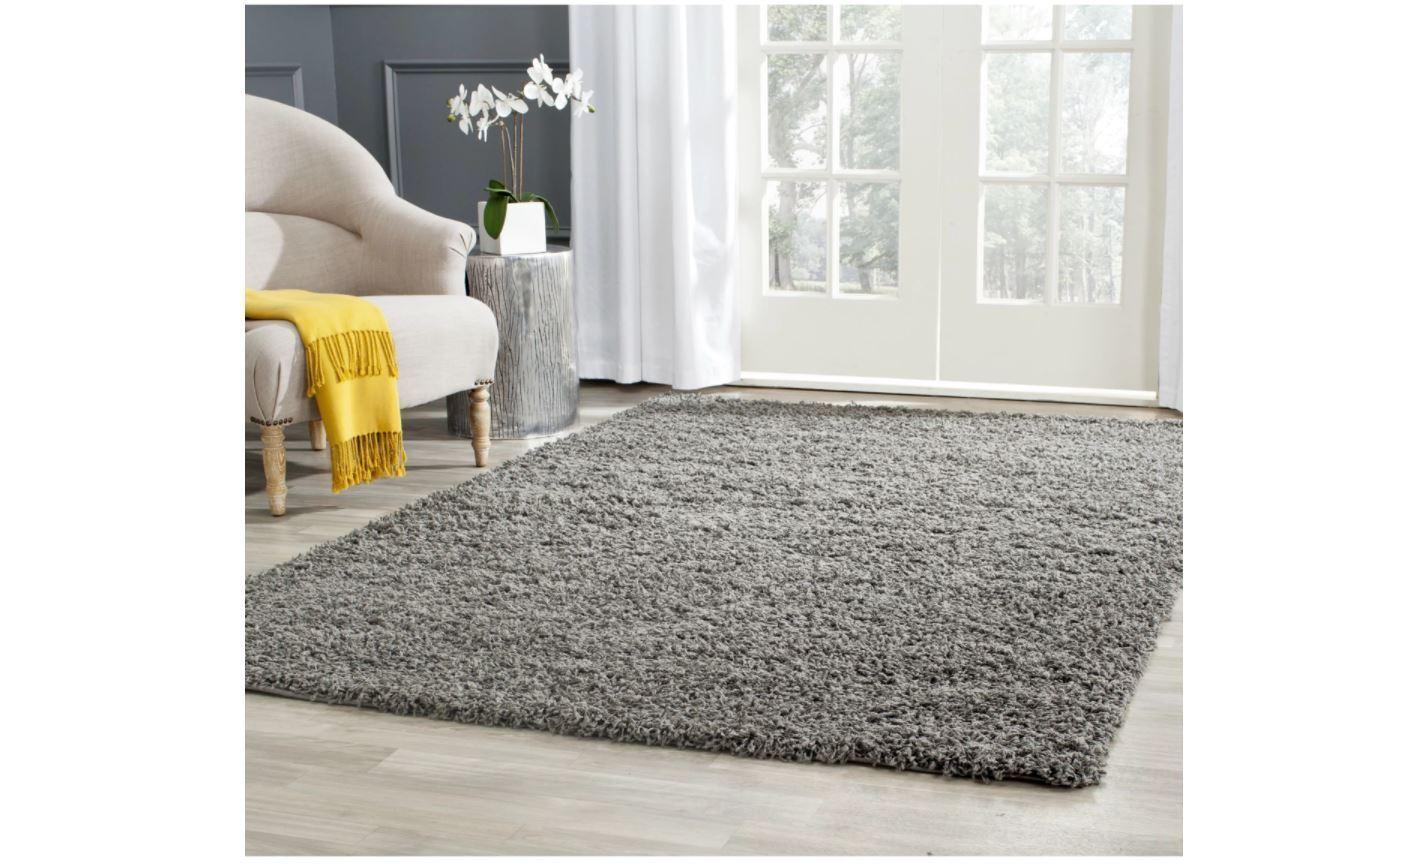 Safavieh Athens Shag Dark Grey Area Rug 9'x12' Carpet Indoor